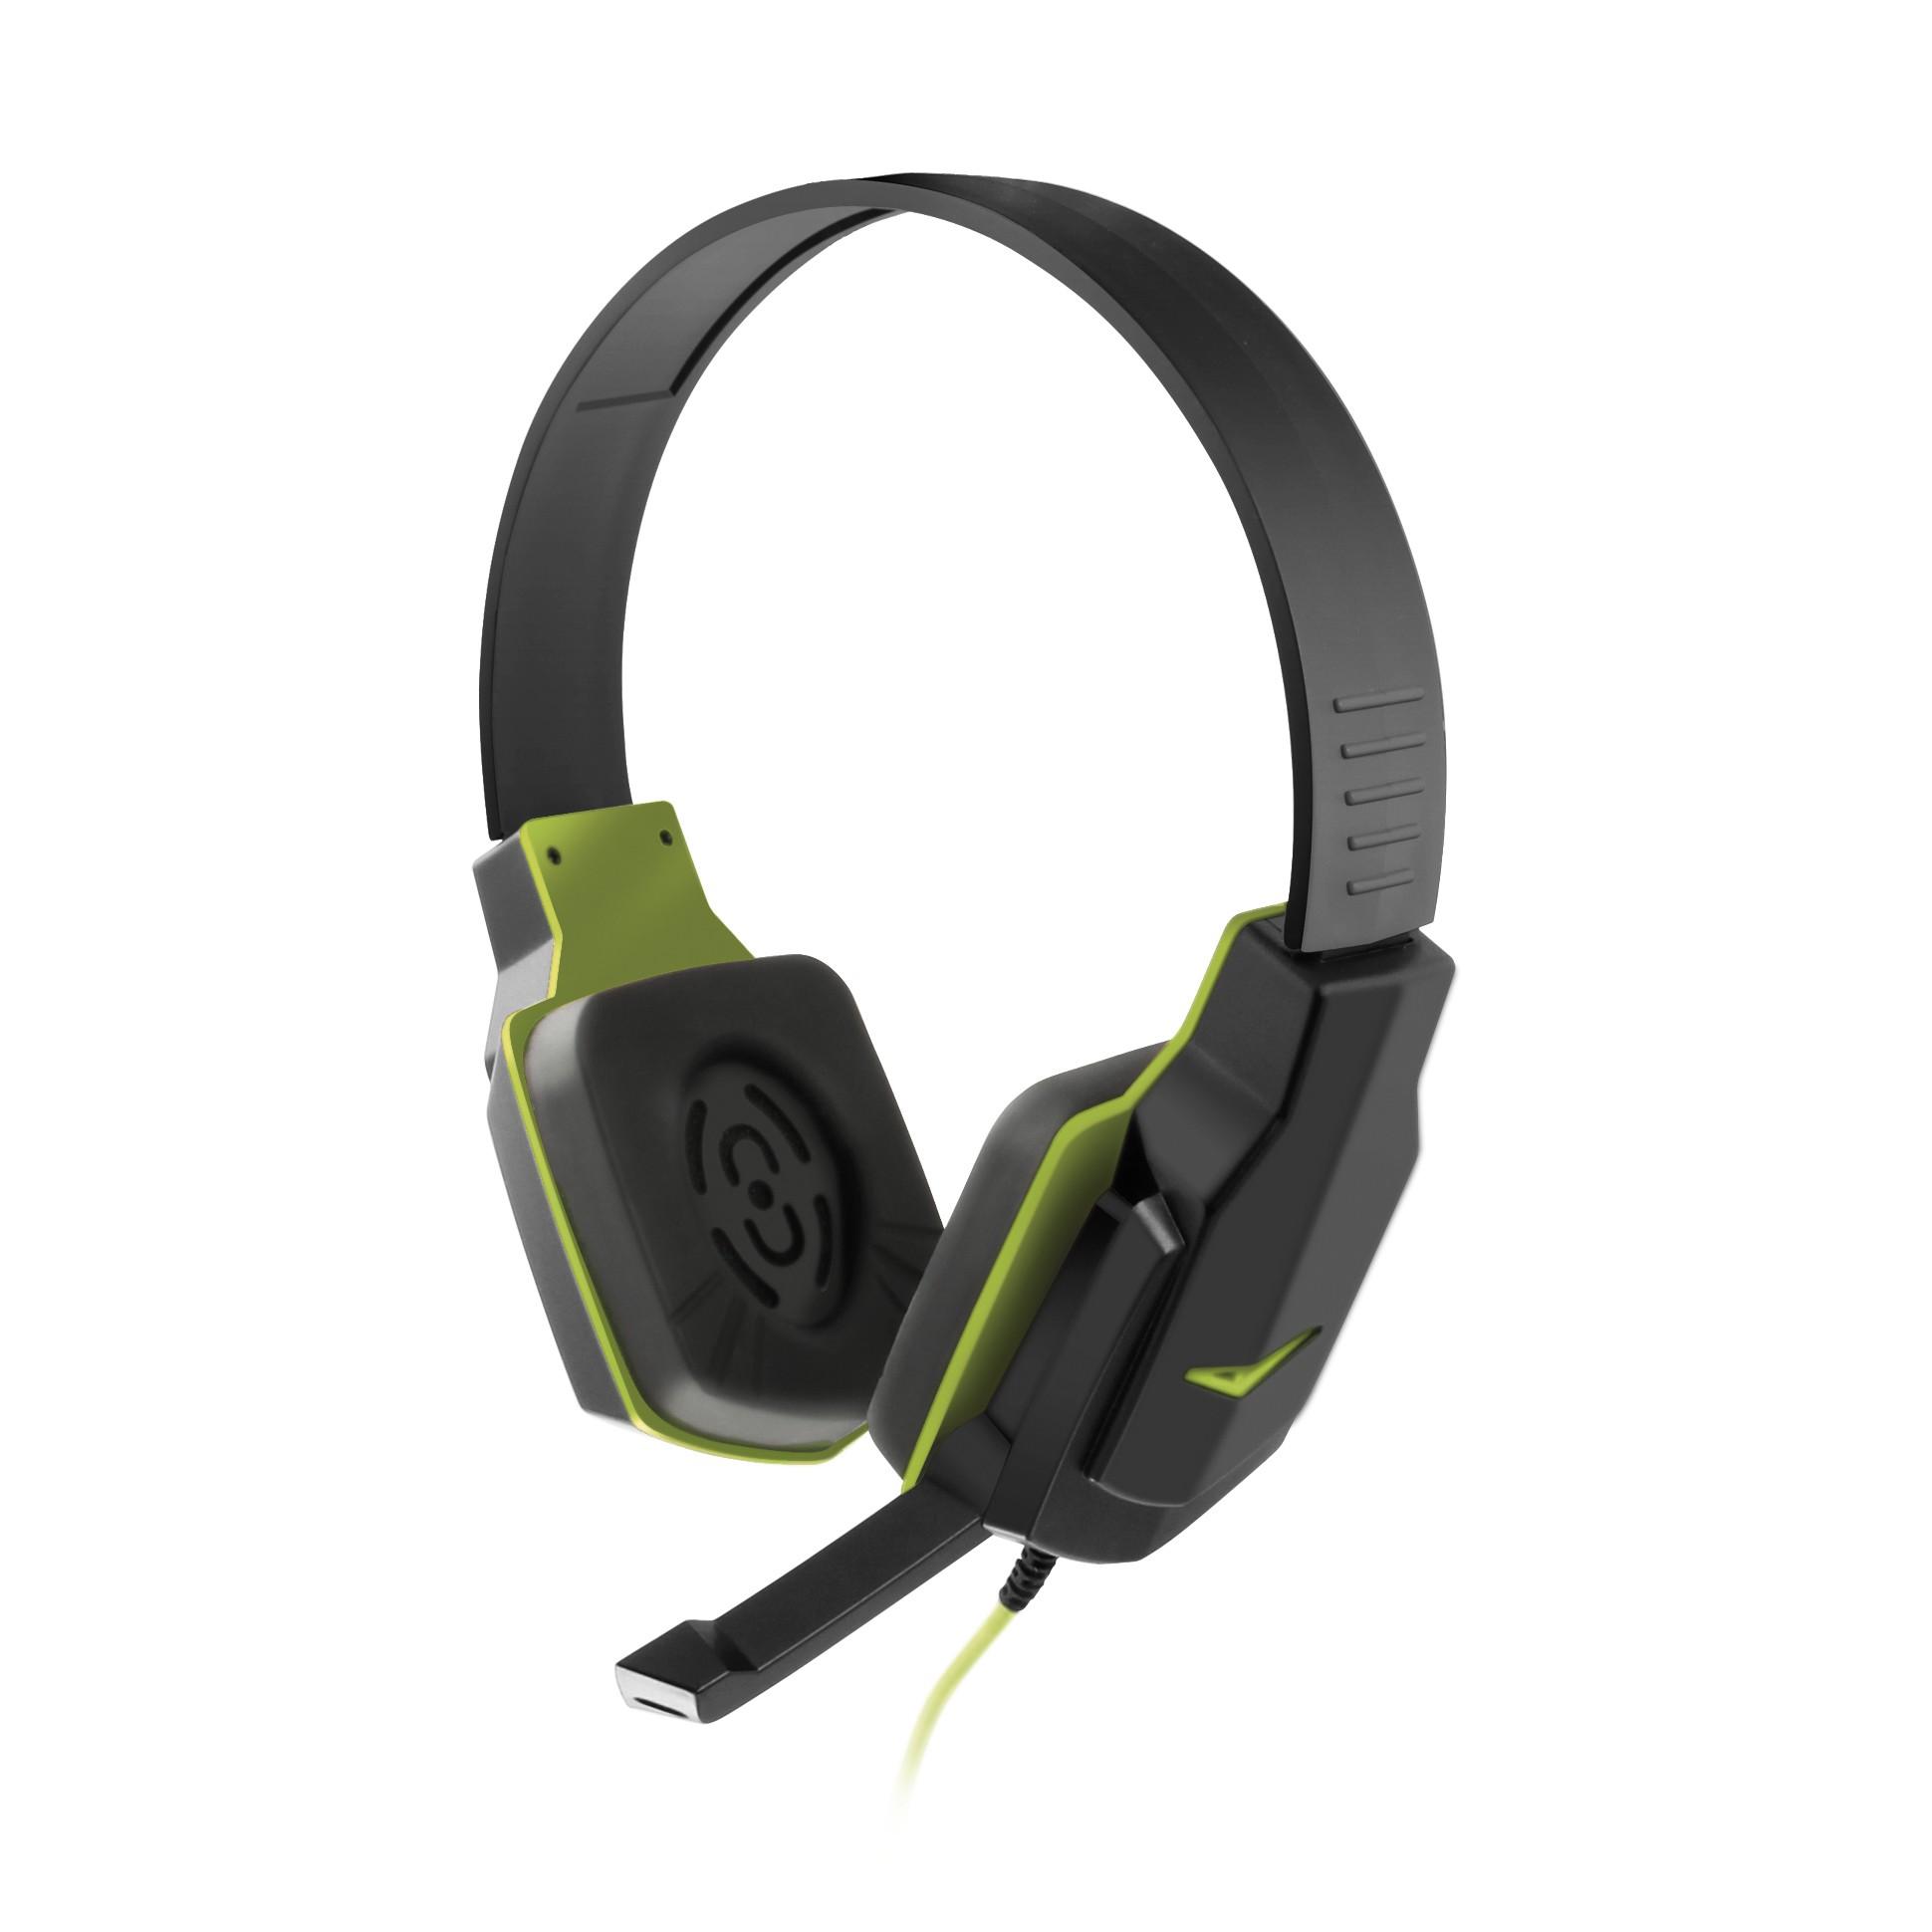 Fone de Ouvido com Microfone Gamer PH146 - Multilaser